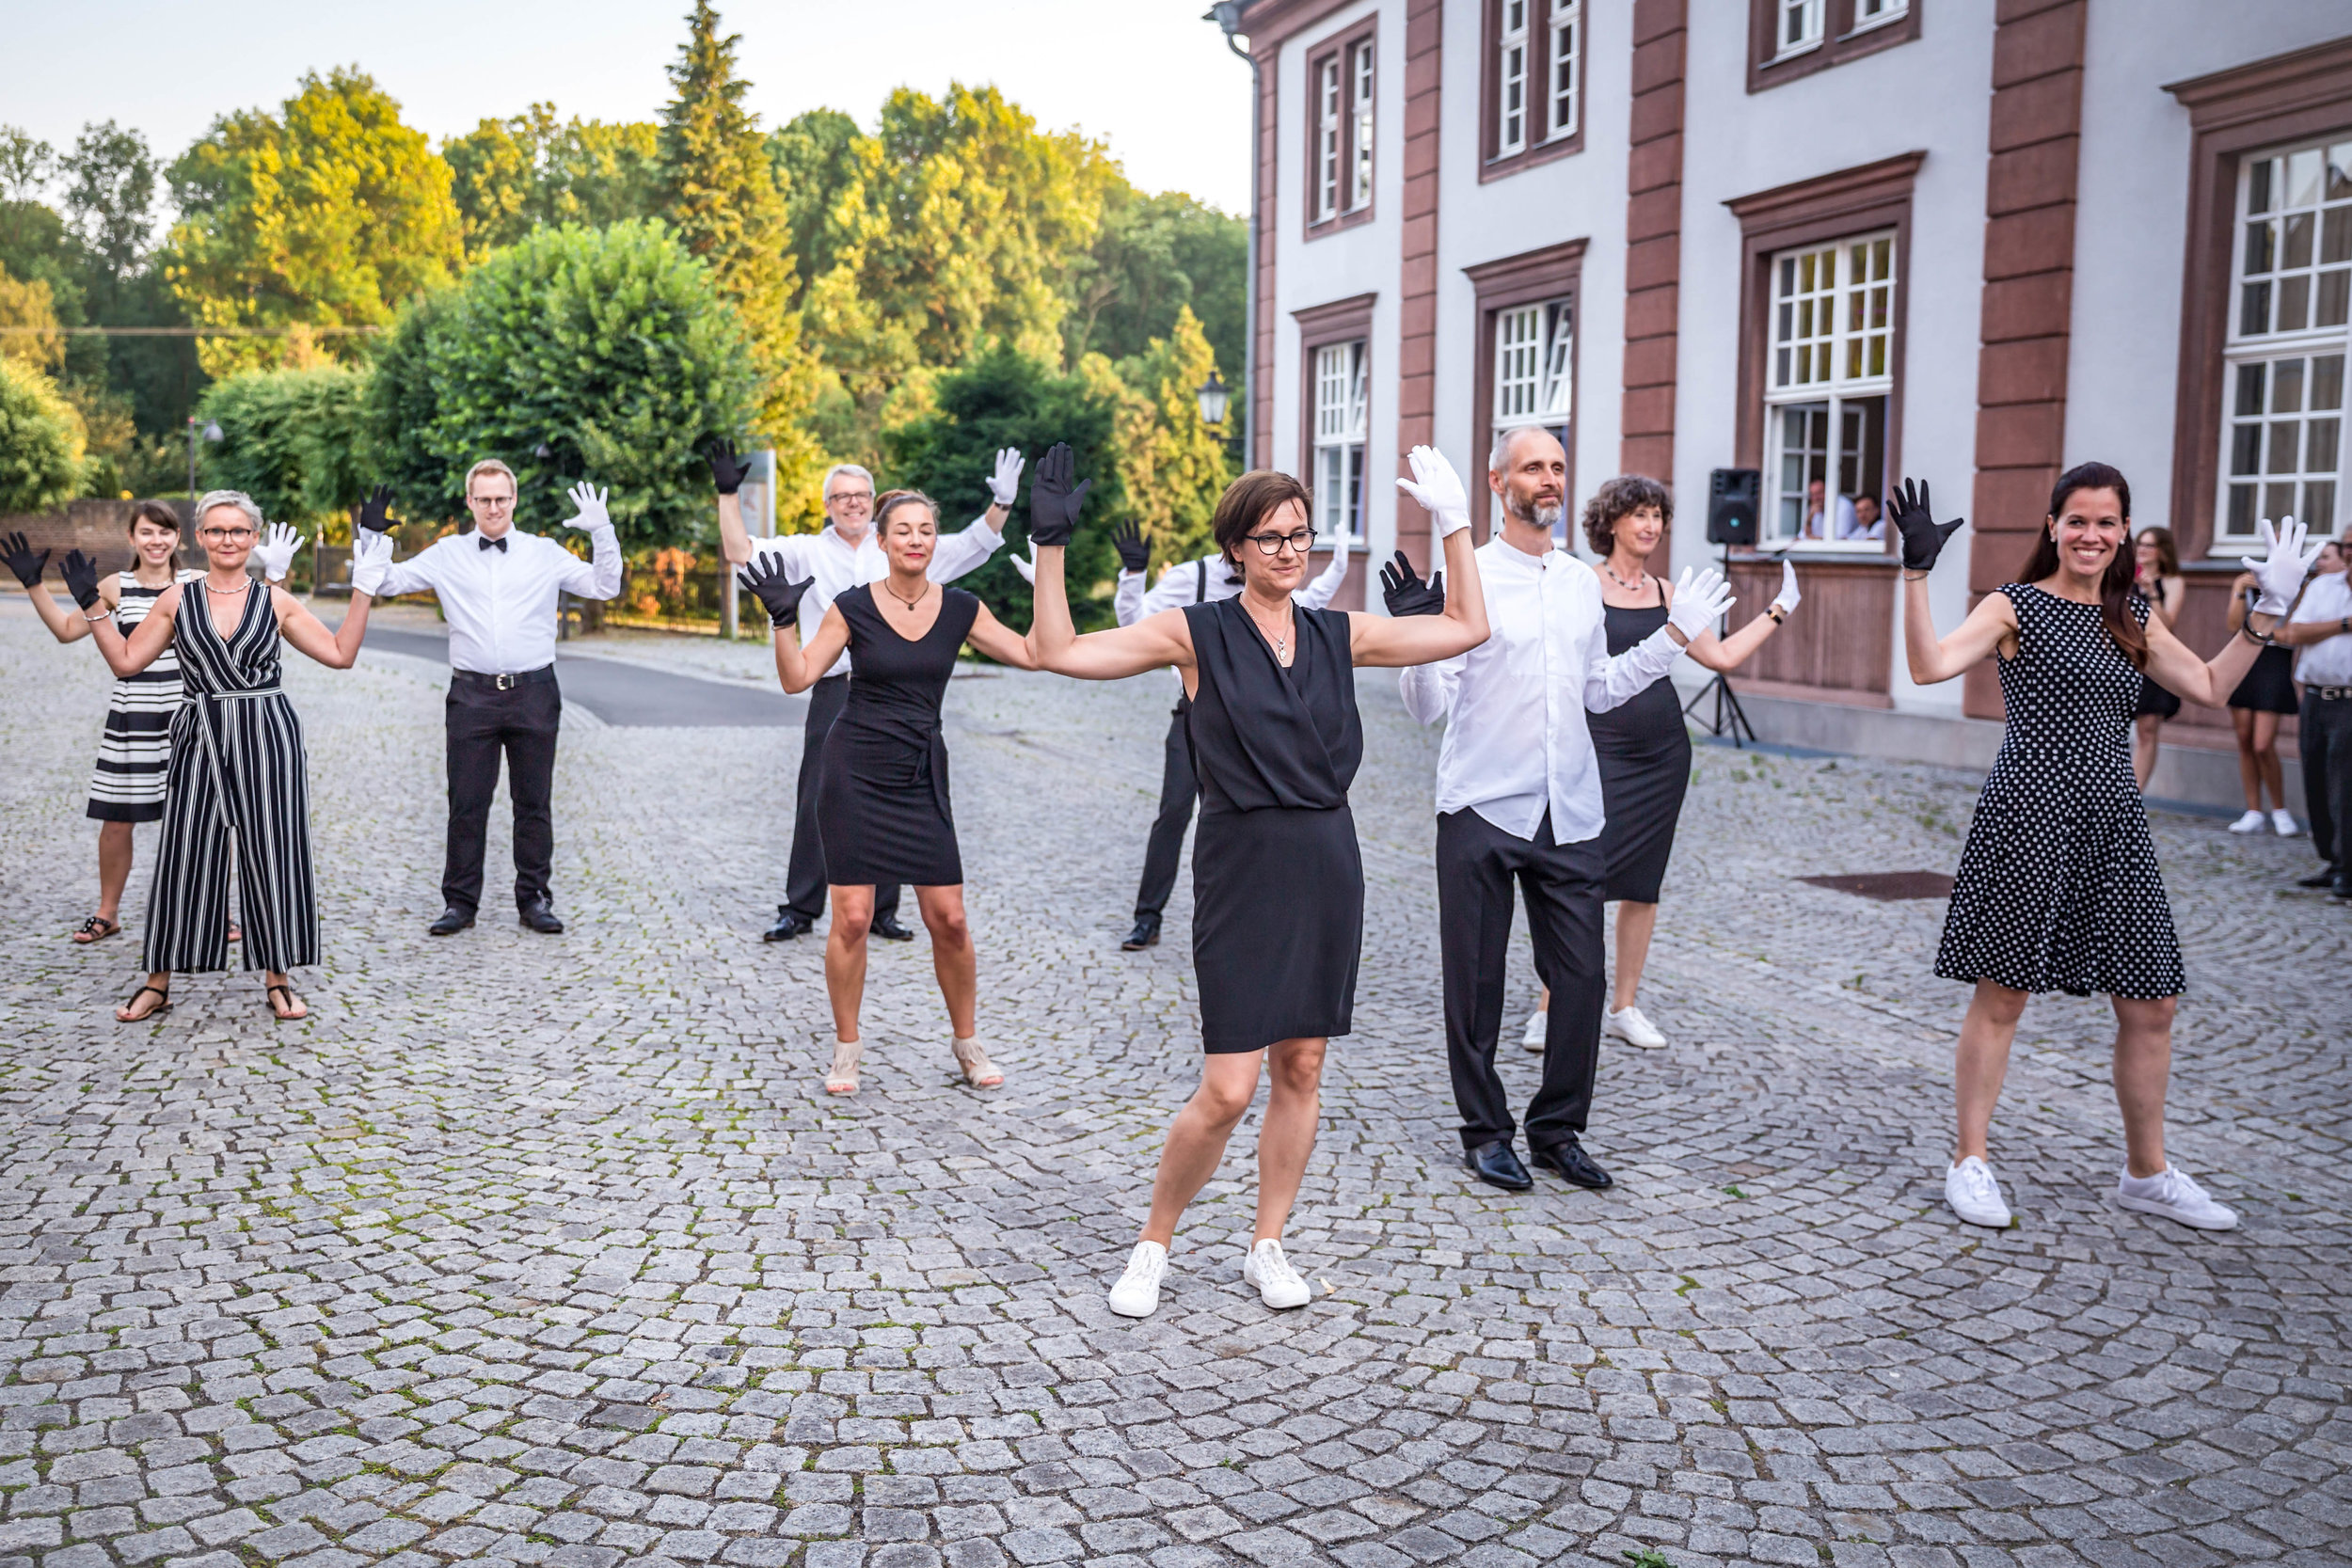 20190626_Akademie_40-jähriges_Jubiläum_kl-5311958.jpg